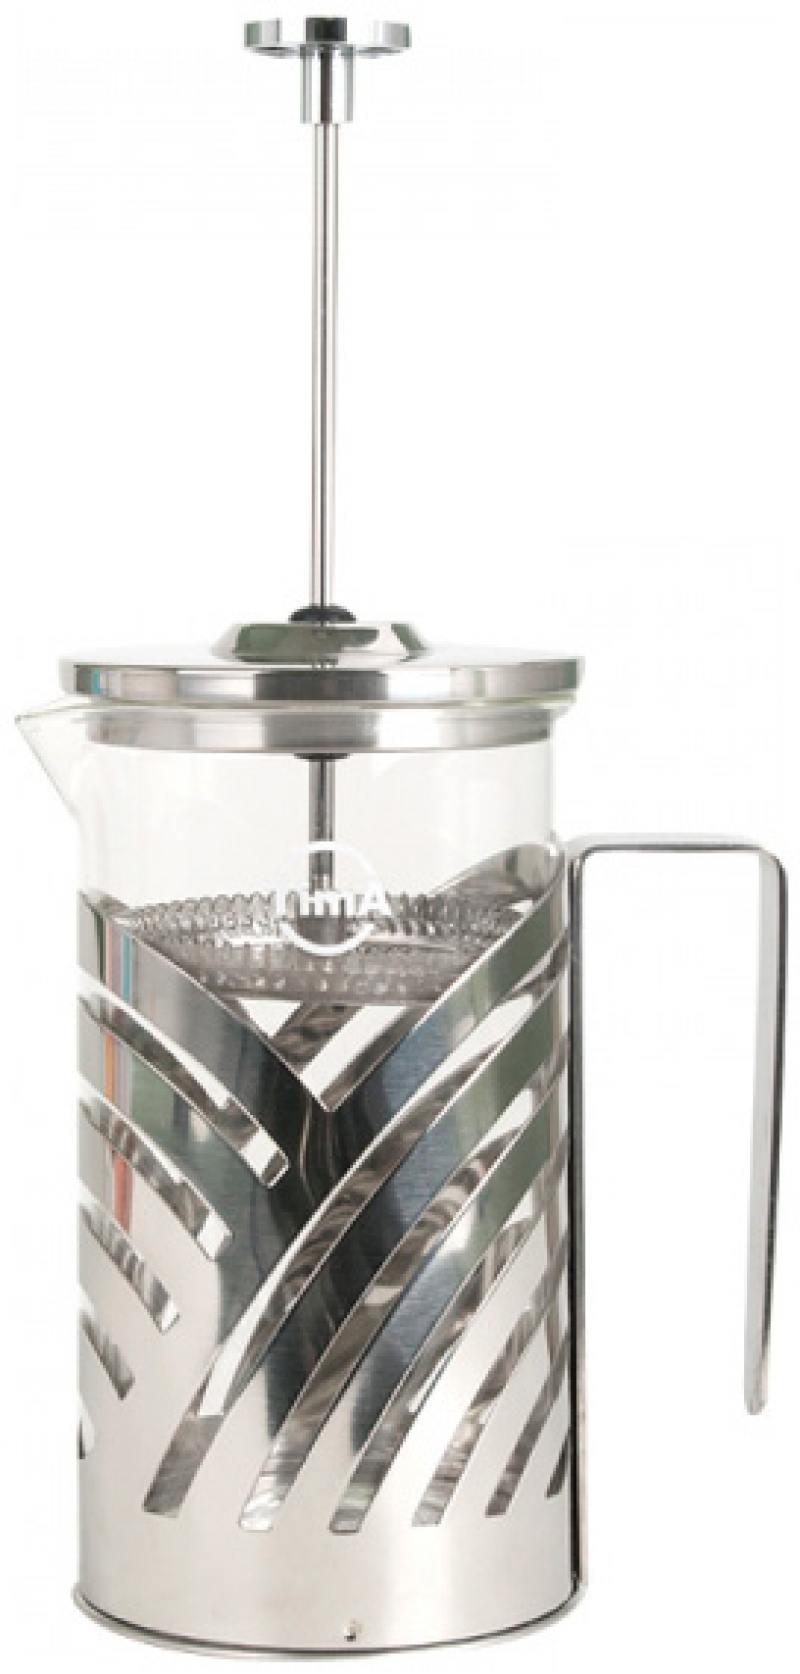 Френч-пресс Tima FB 600 0.6 л металл/стекло серебристый